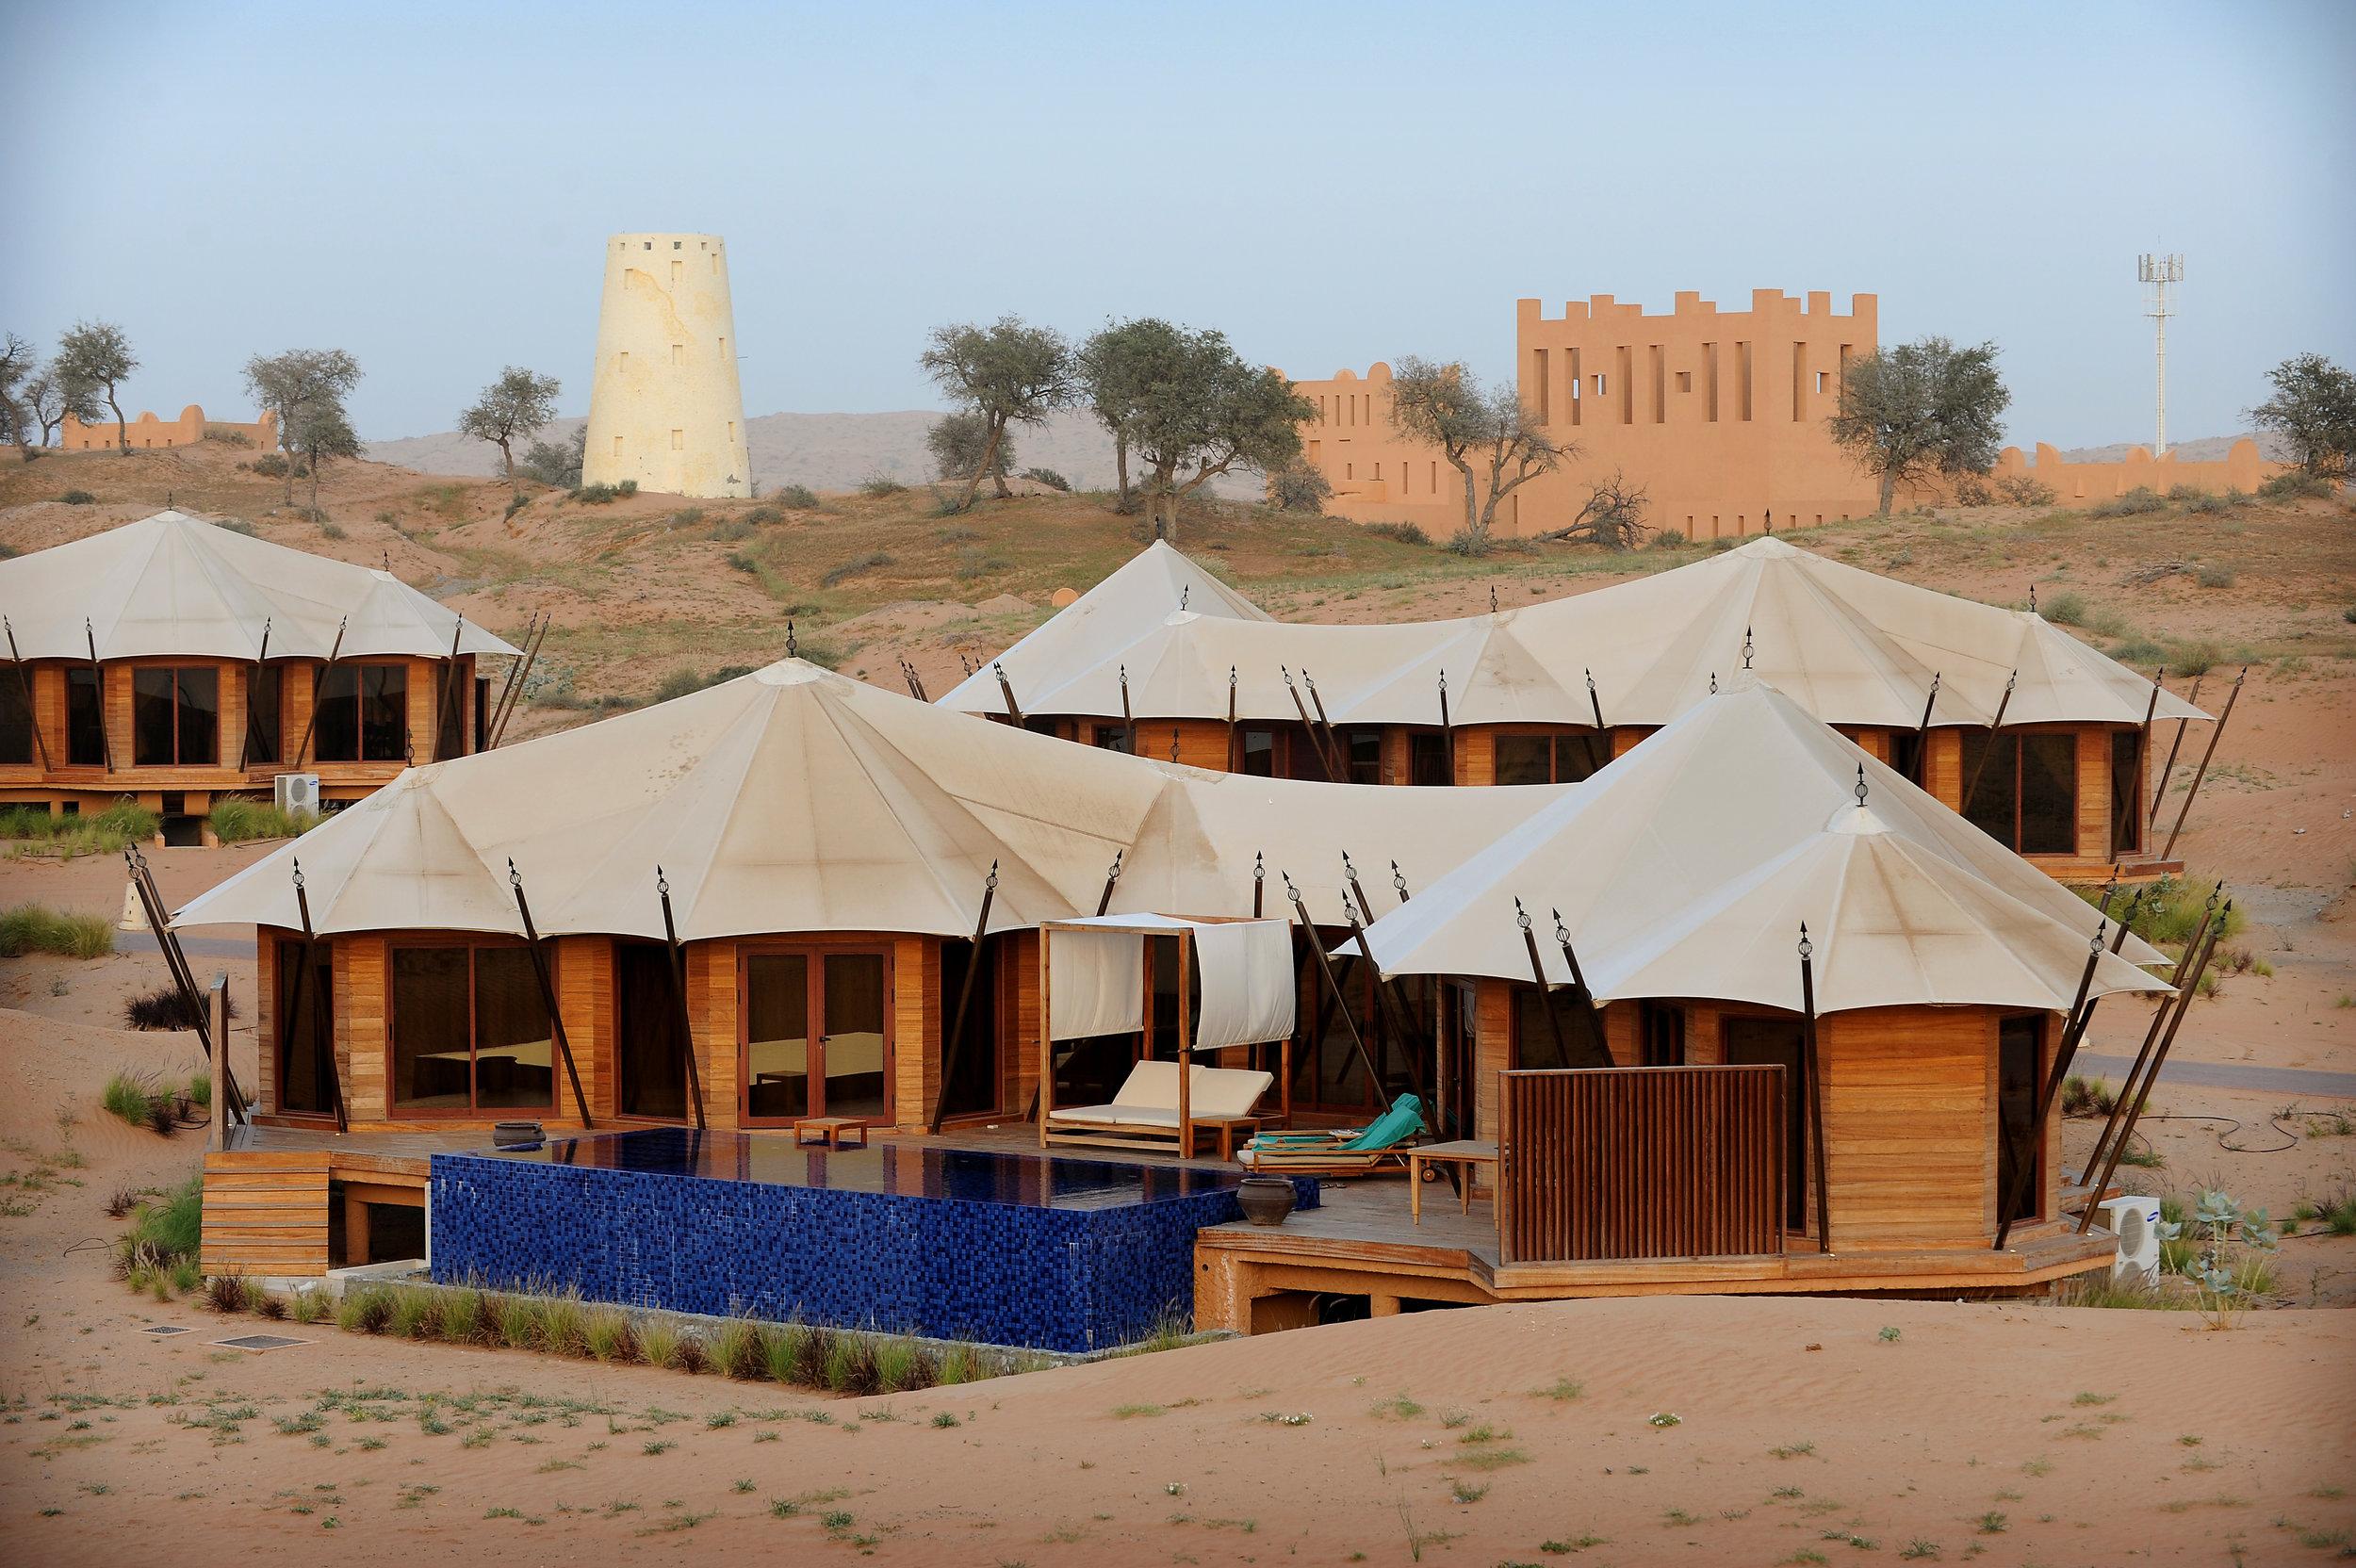 UAE, Yhdistyneet Arabiemiirikunnat, uima-allas, Al Wadi, teltta, aavikko